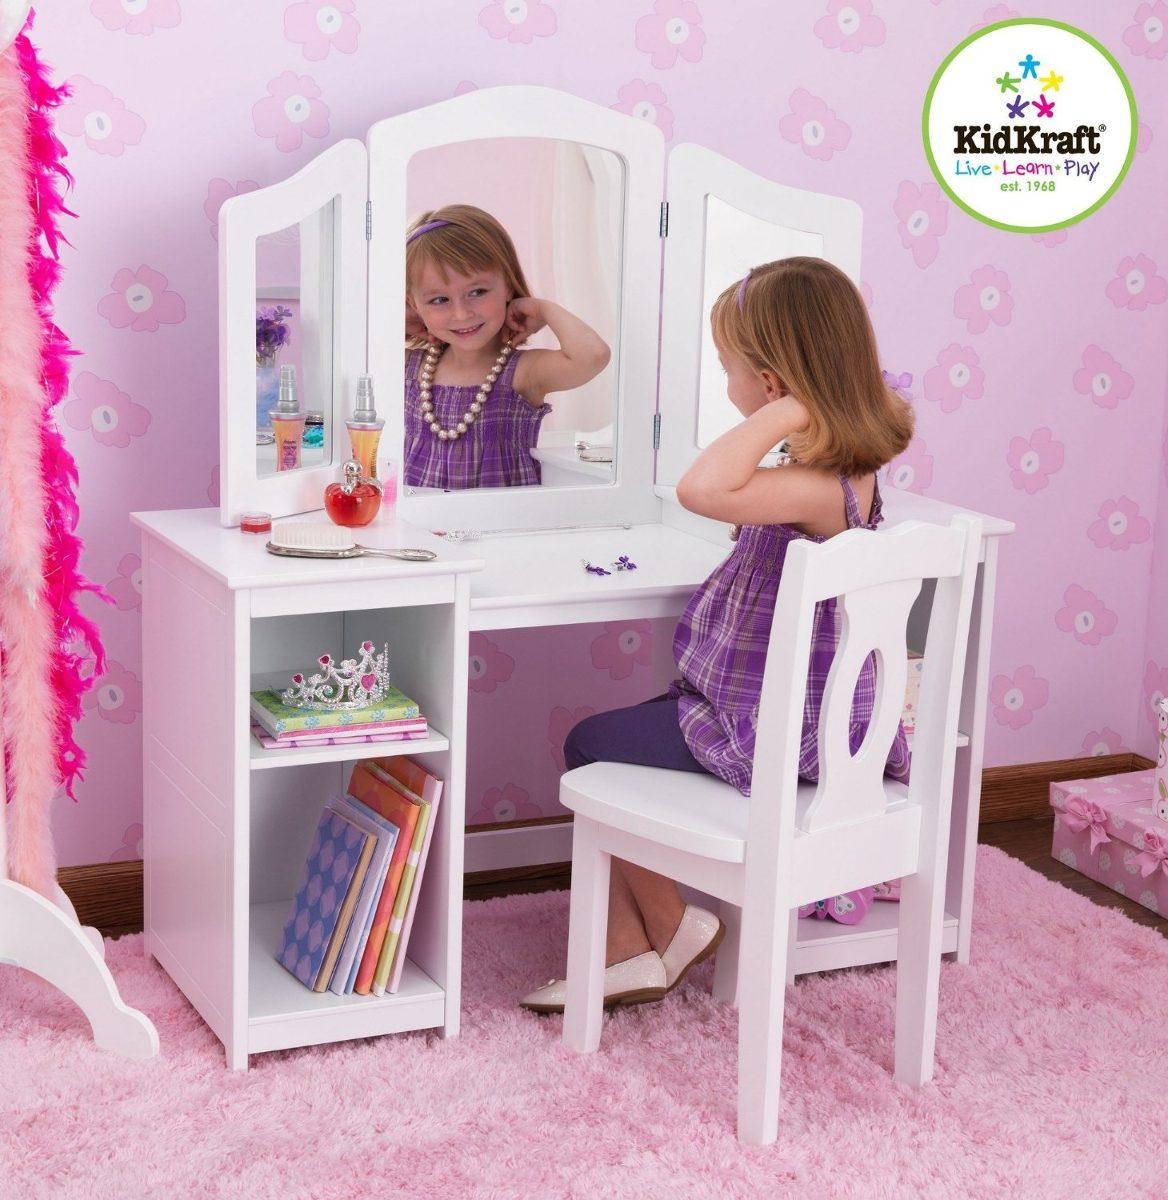 Muebles De Nias Cool Affordable Cool Simple Mobiliario De Cocina - Tocador-madera-nia